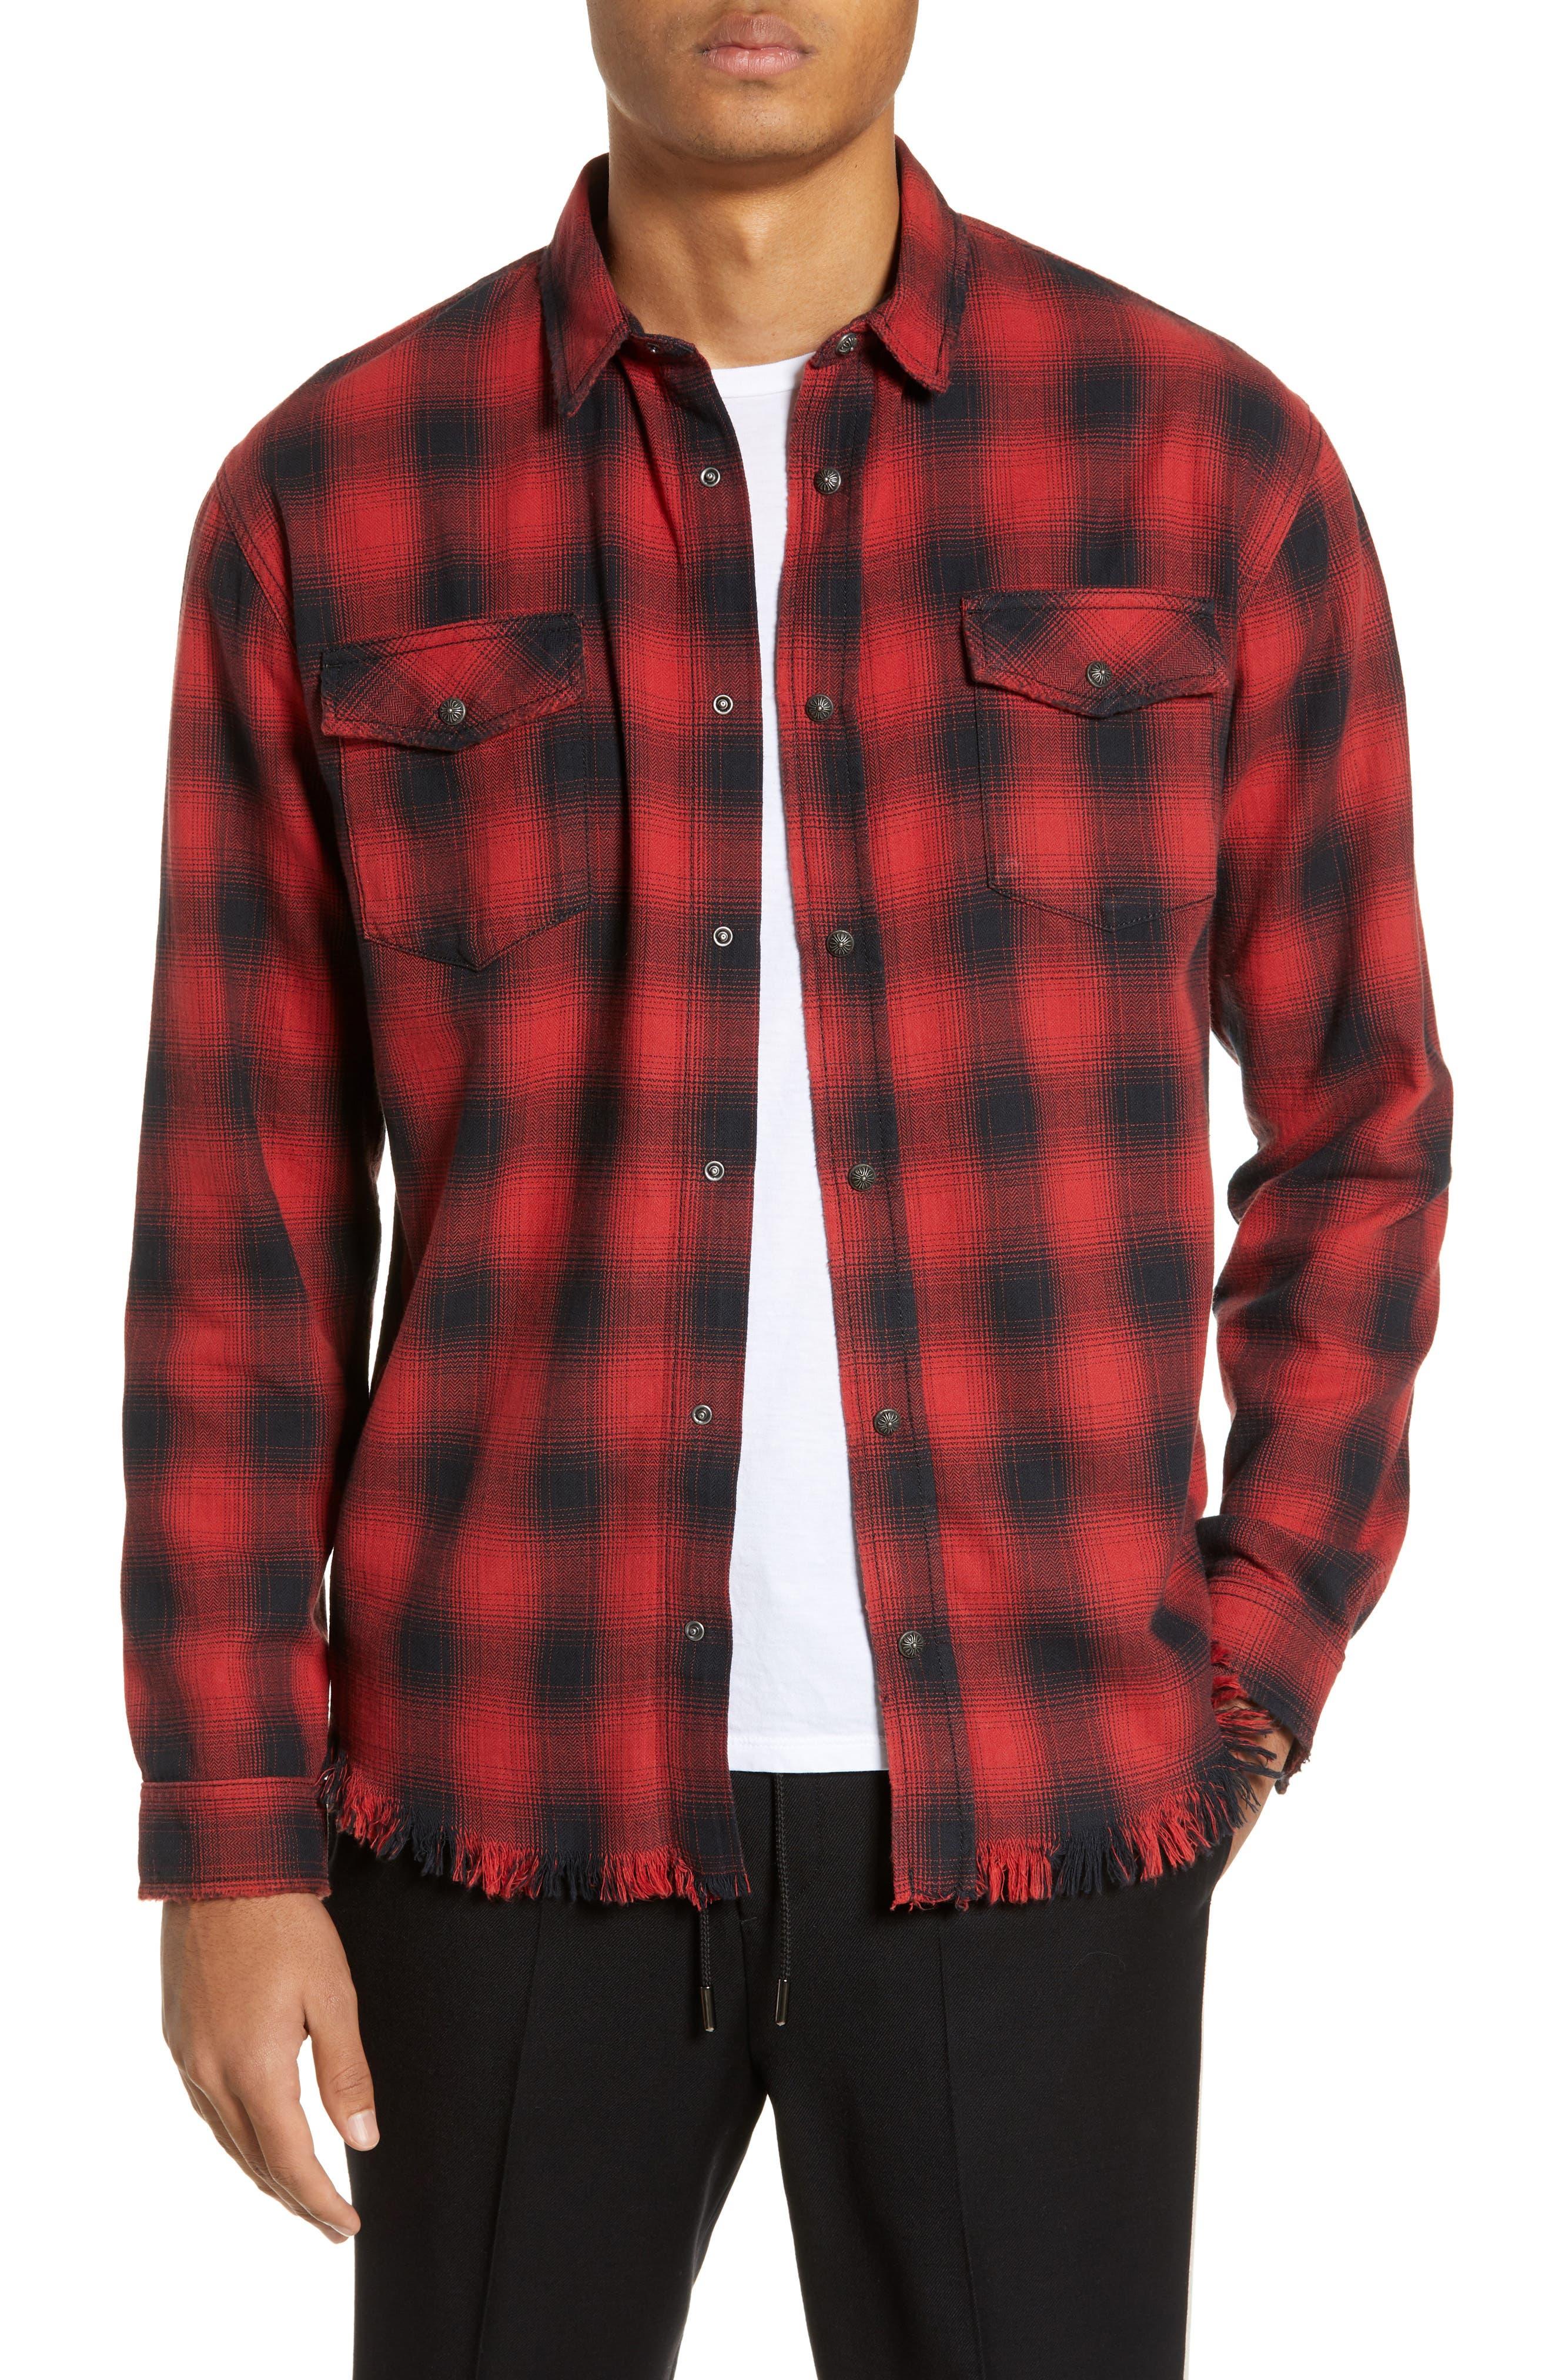 THE KOOPLES, Regular Fit Ombré Plaid Shirt, Main thumbnail 1, color, RED / BLACK